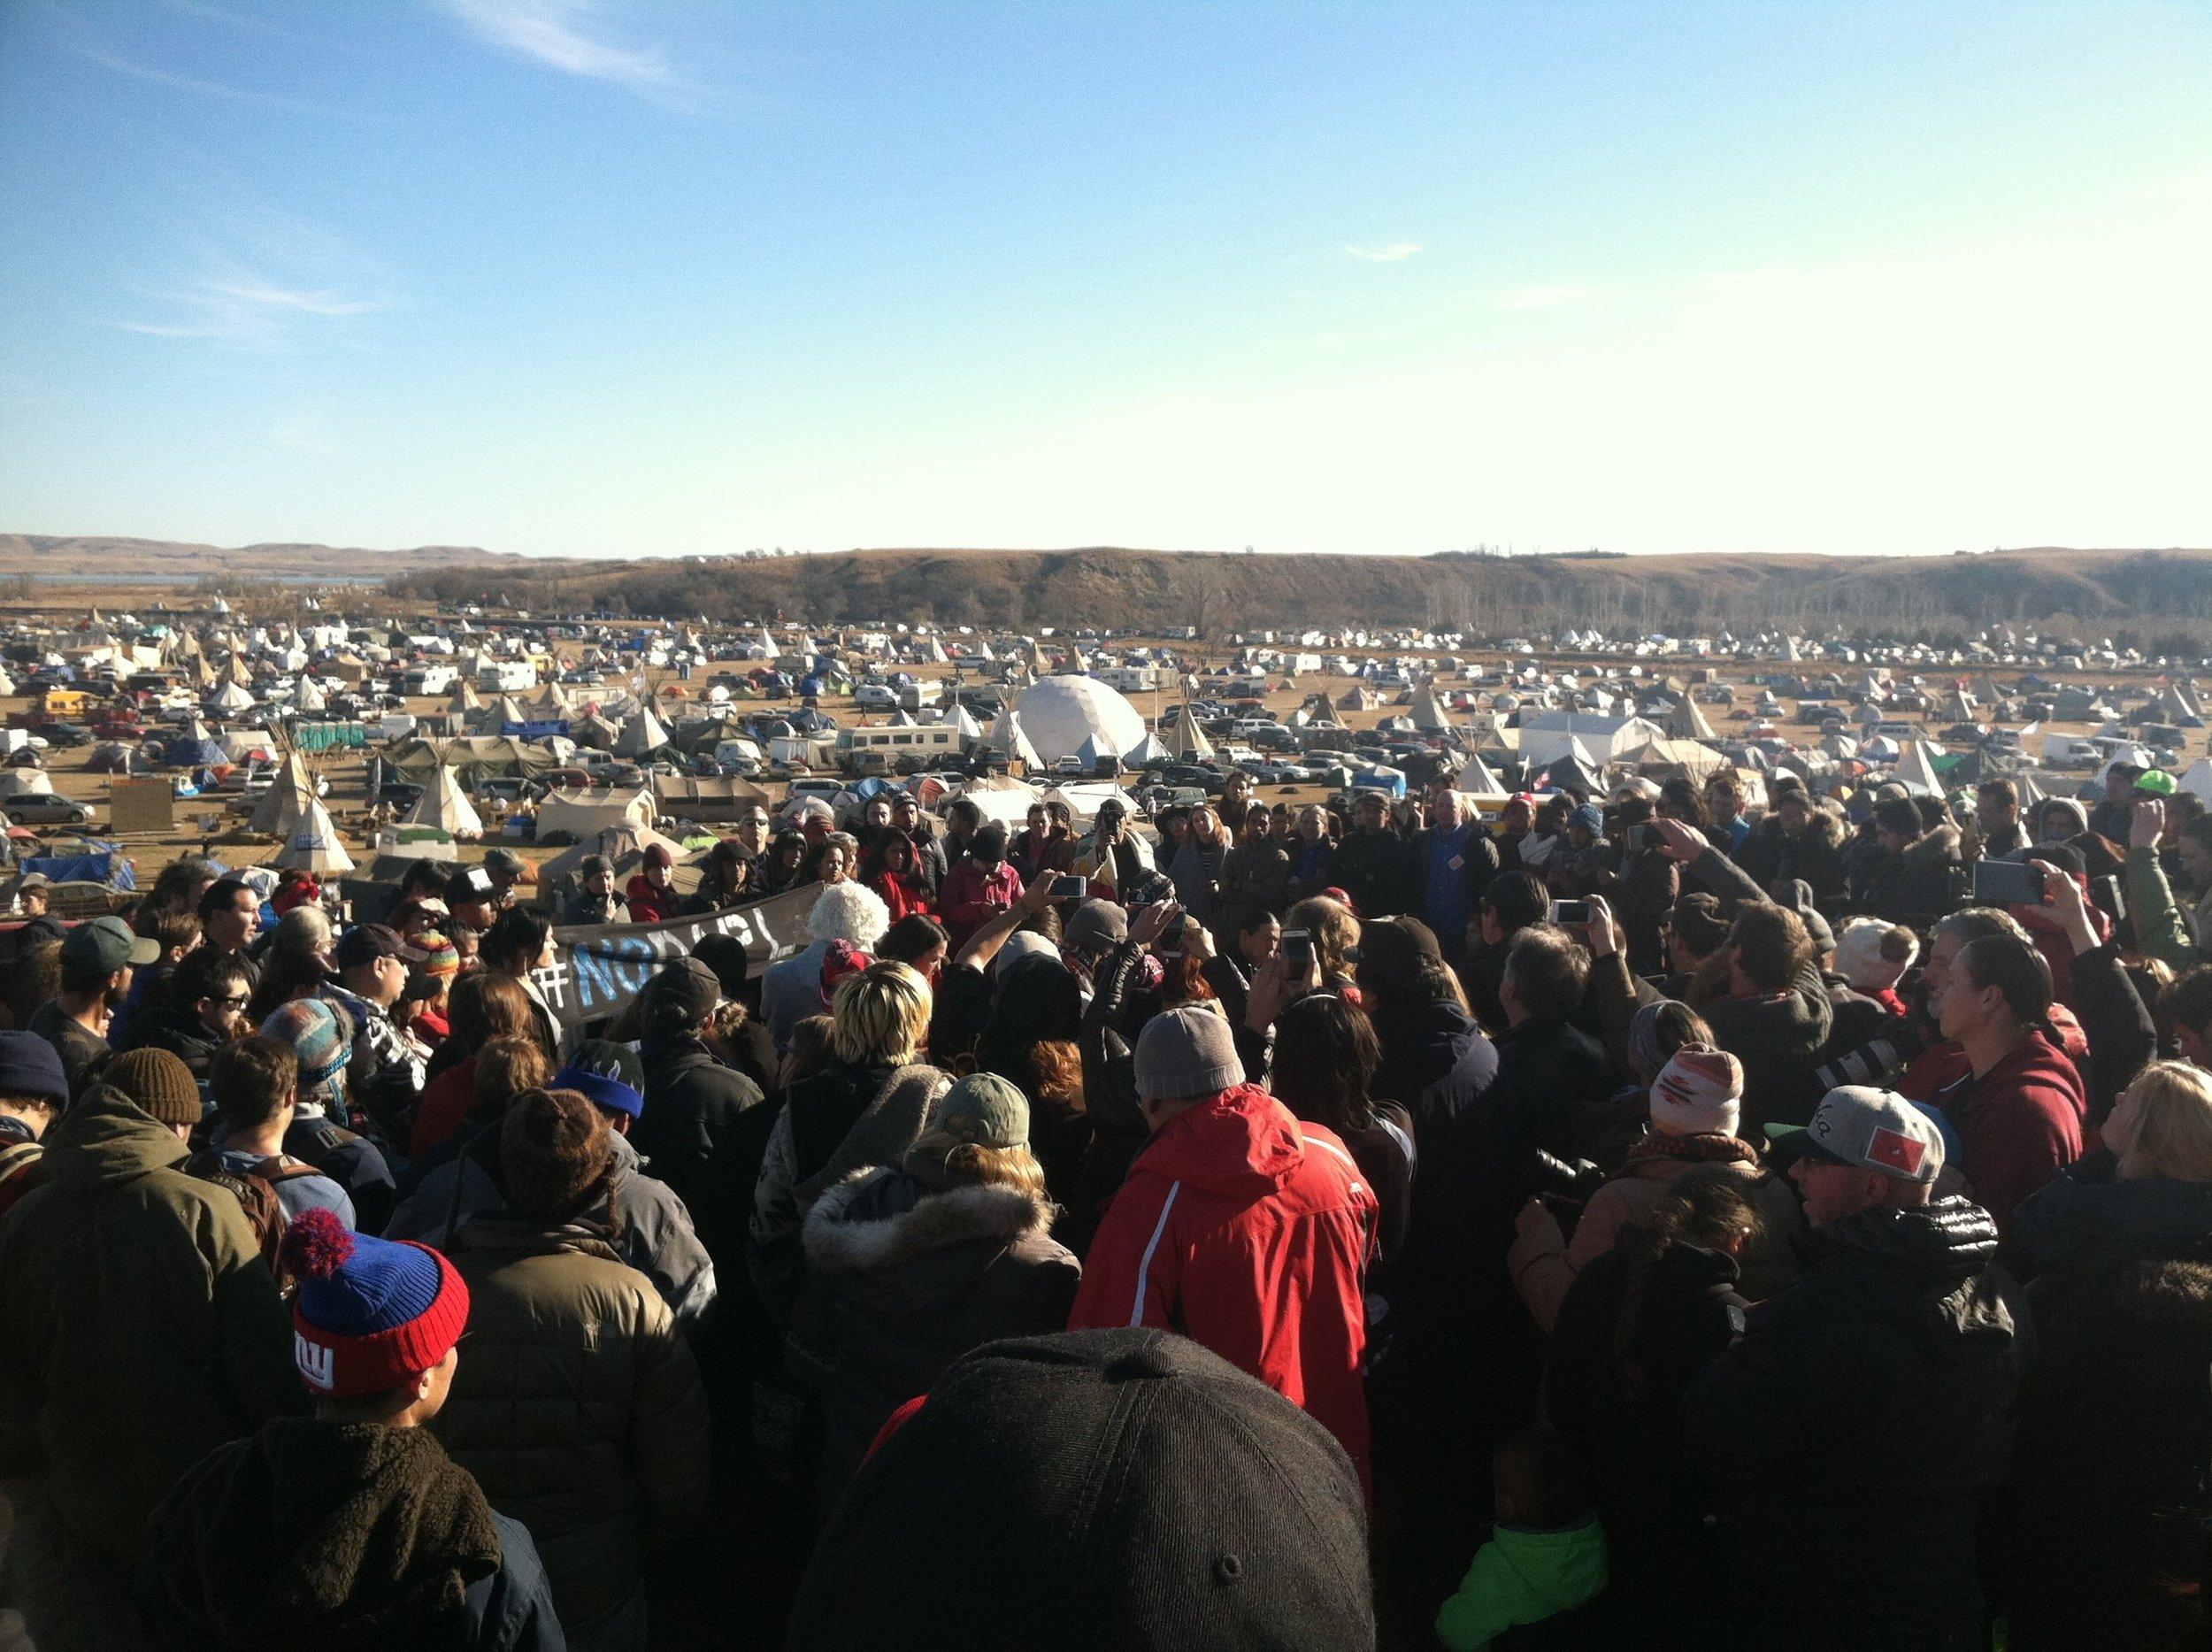 A press conference at the Oceti Sakowin Camp - Standing Rock, North Dakota